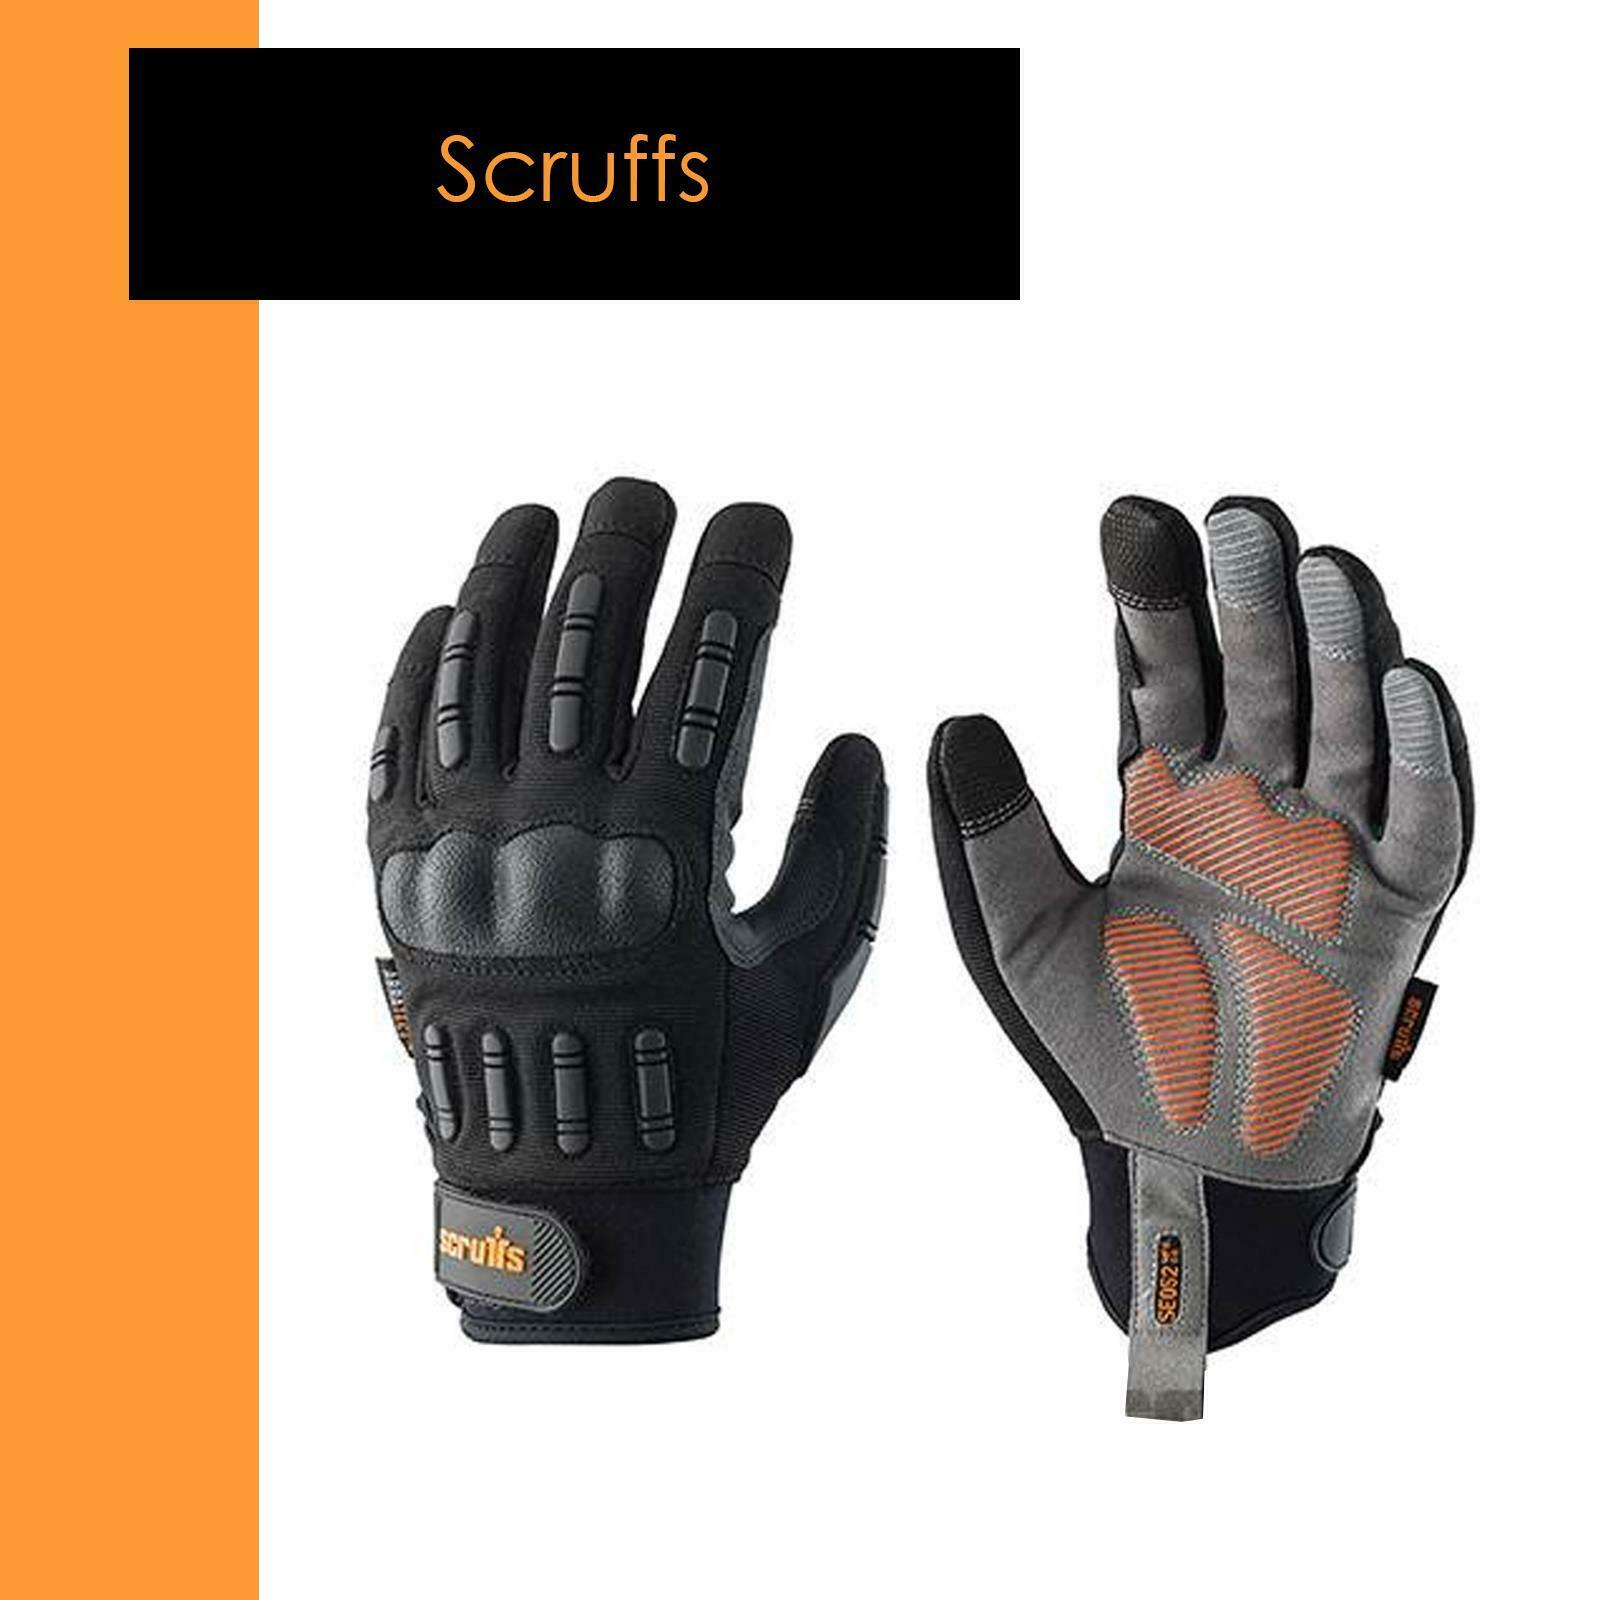 Men's Trade Work Safety Gloves Padded Reflective Work Gloves L/9- Scruffs